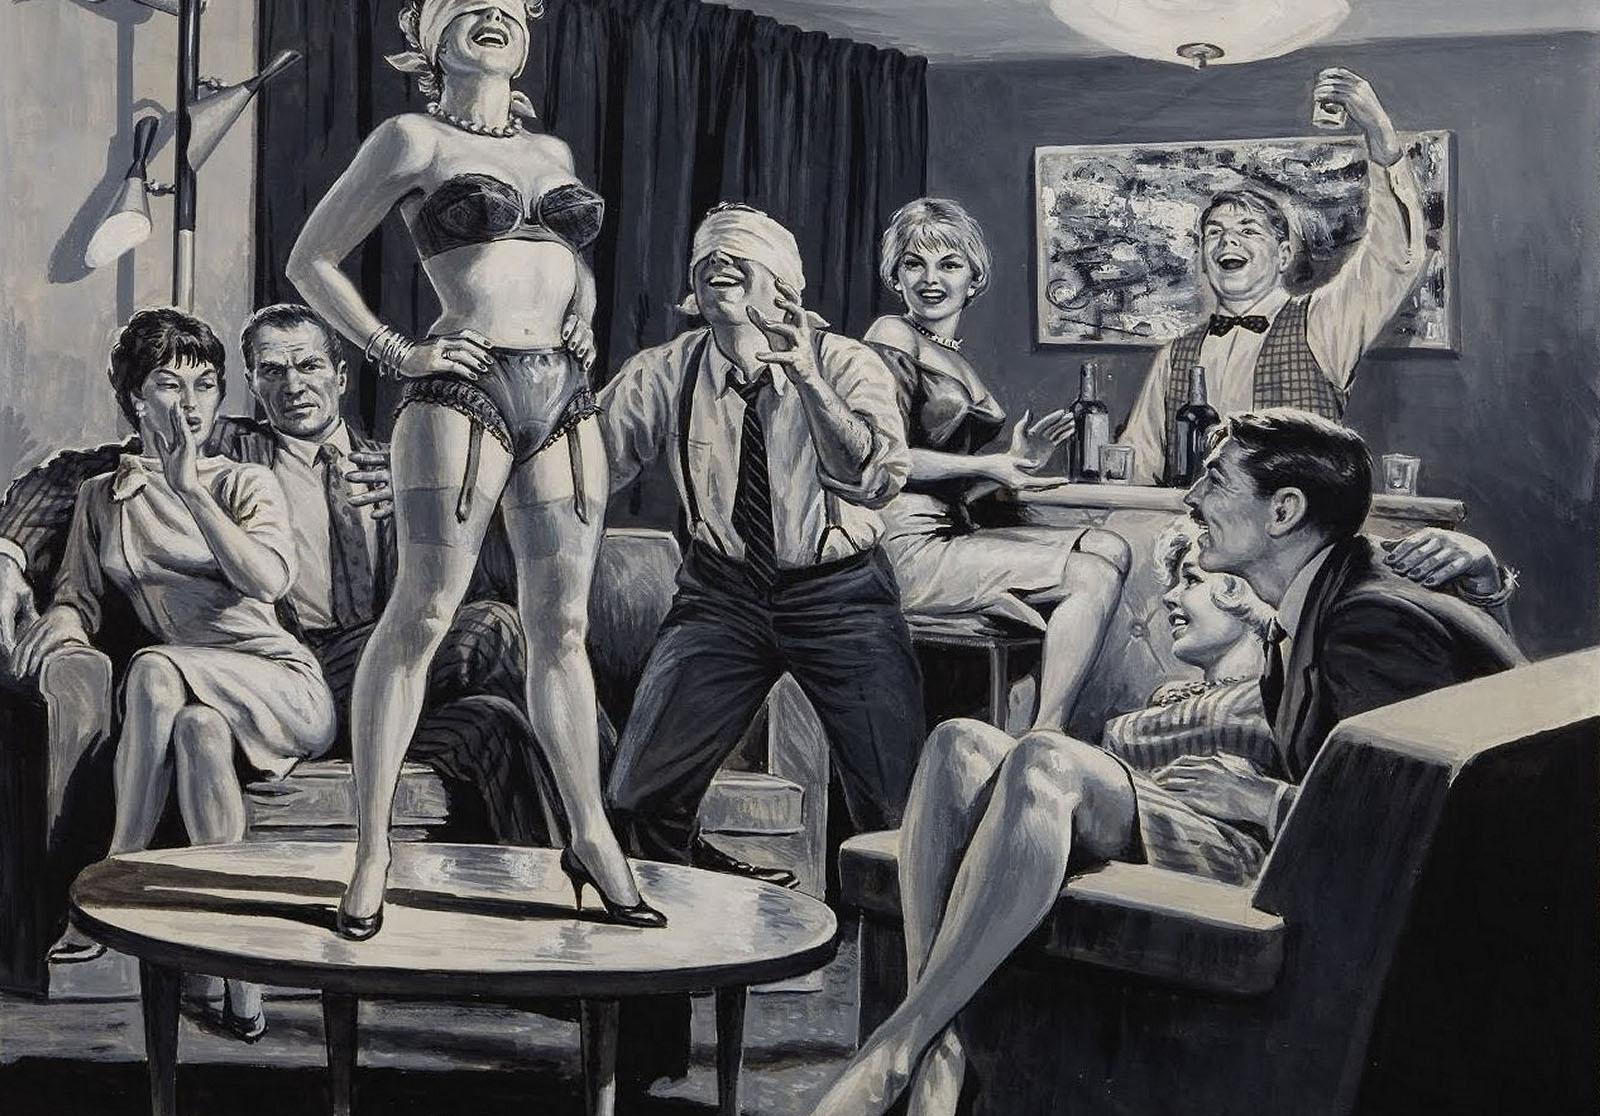 www  com striptease show